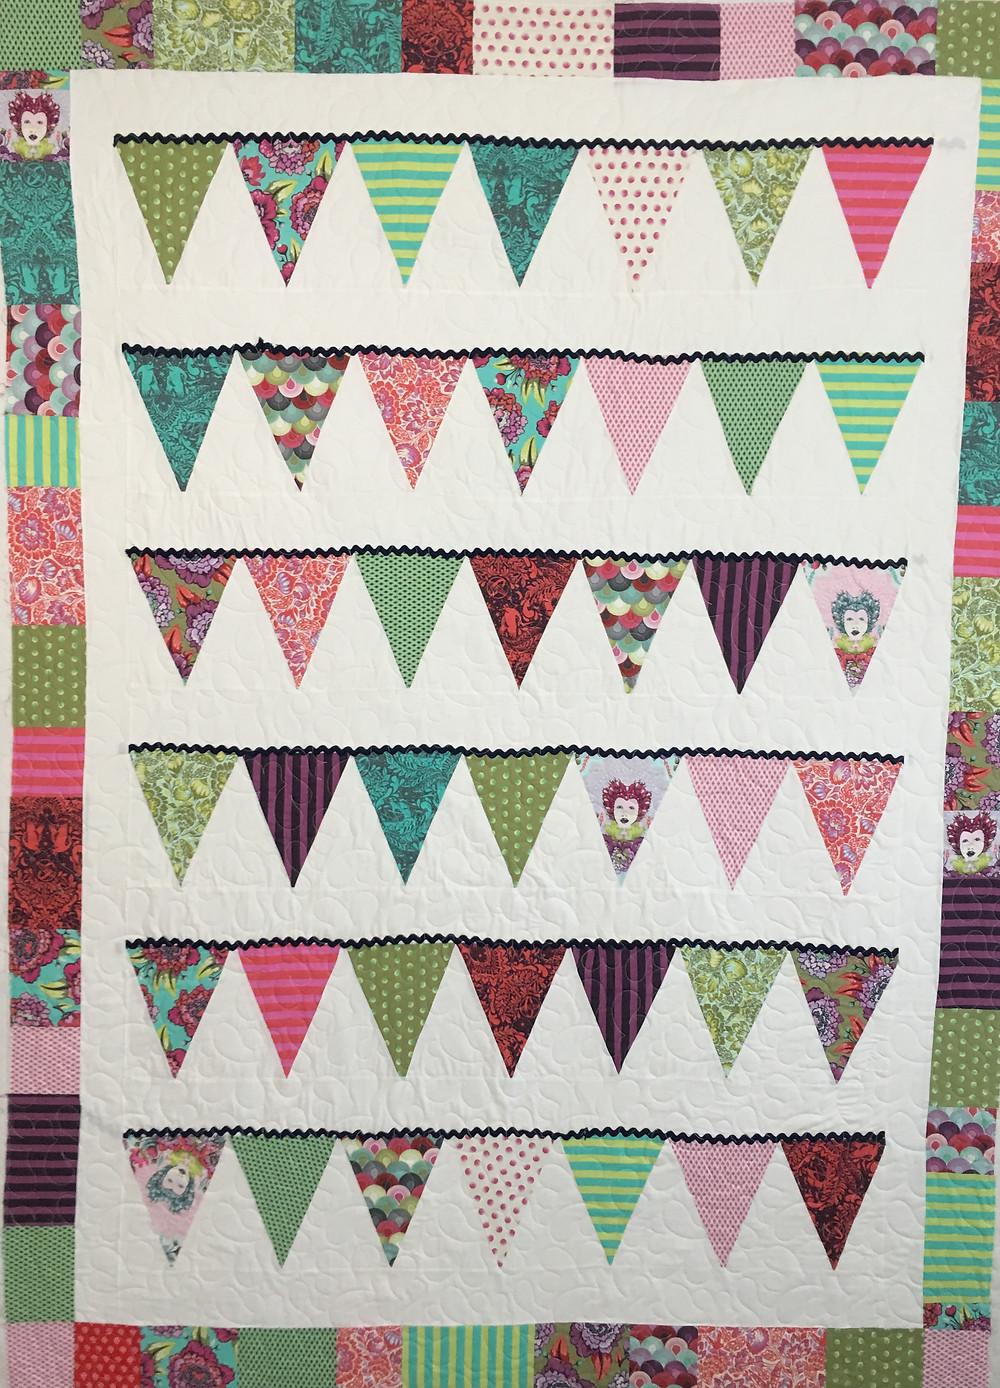 Pennant Quilt by Elizabeth Cicchino